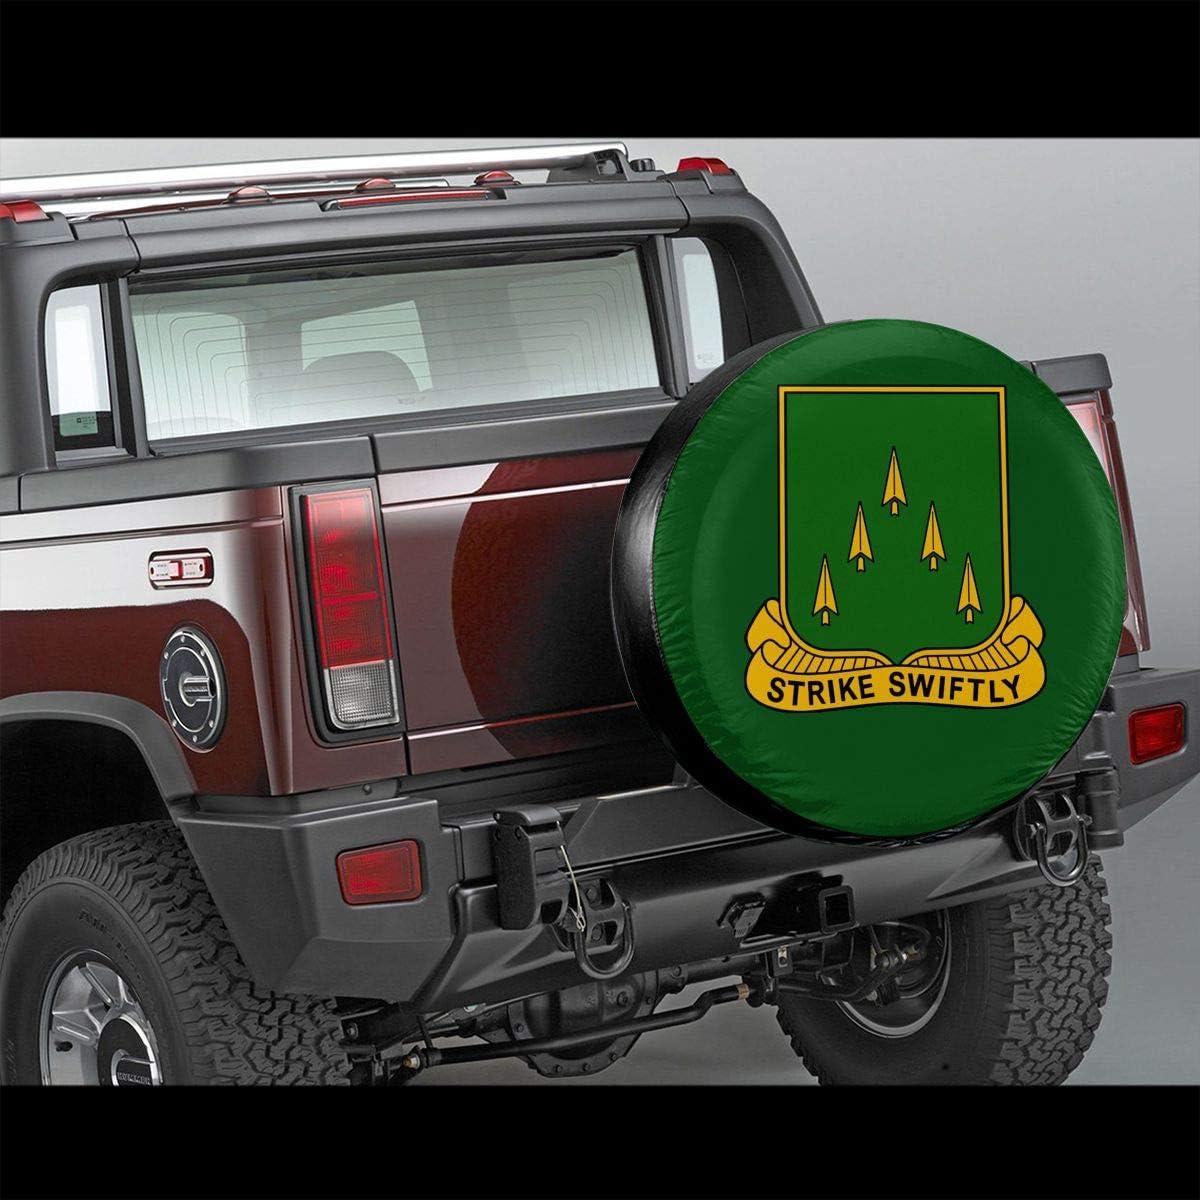 Live The Legend Spare Tire Wheel Cover Car Truck SUV Camper Fits for Jeep Wrangler Sahara GLTDJESW 1st Air Cavalry Division Air Cav